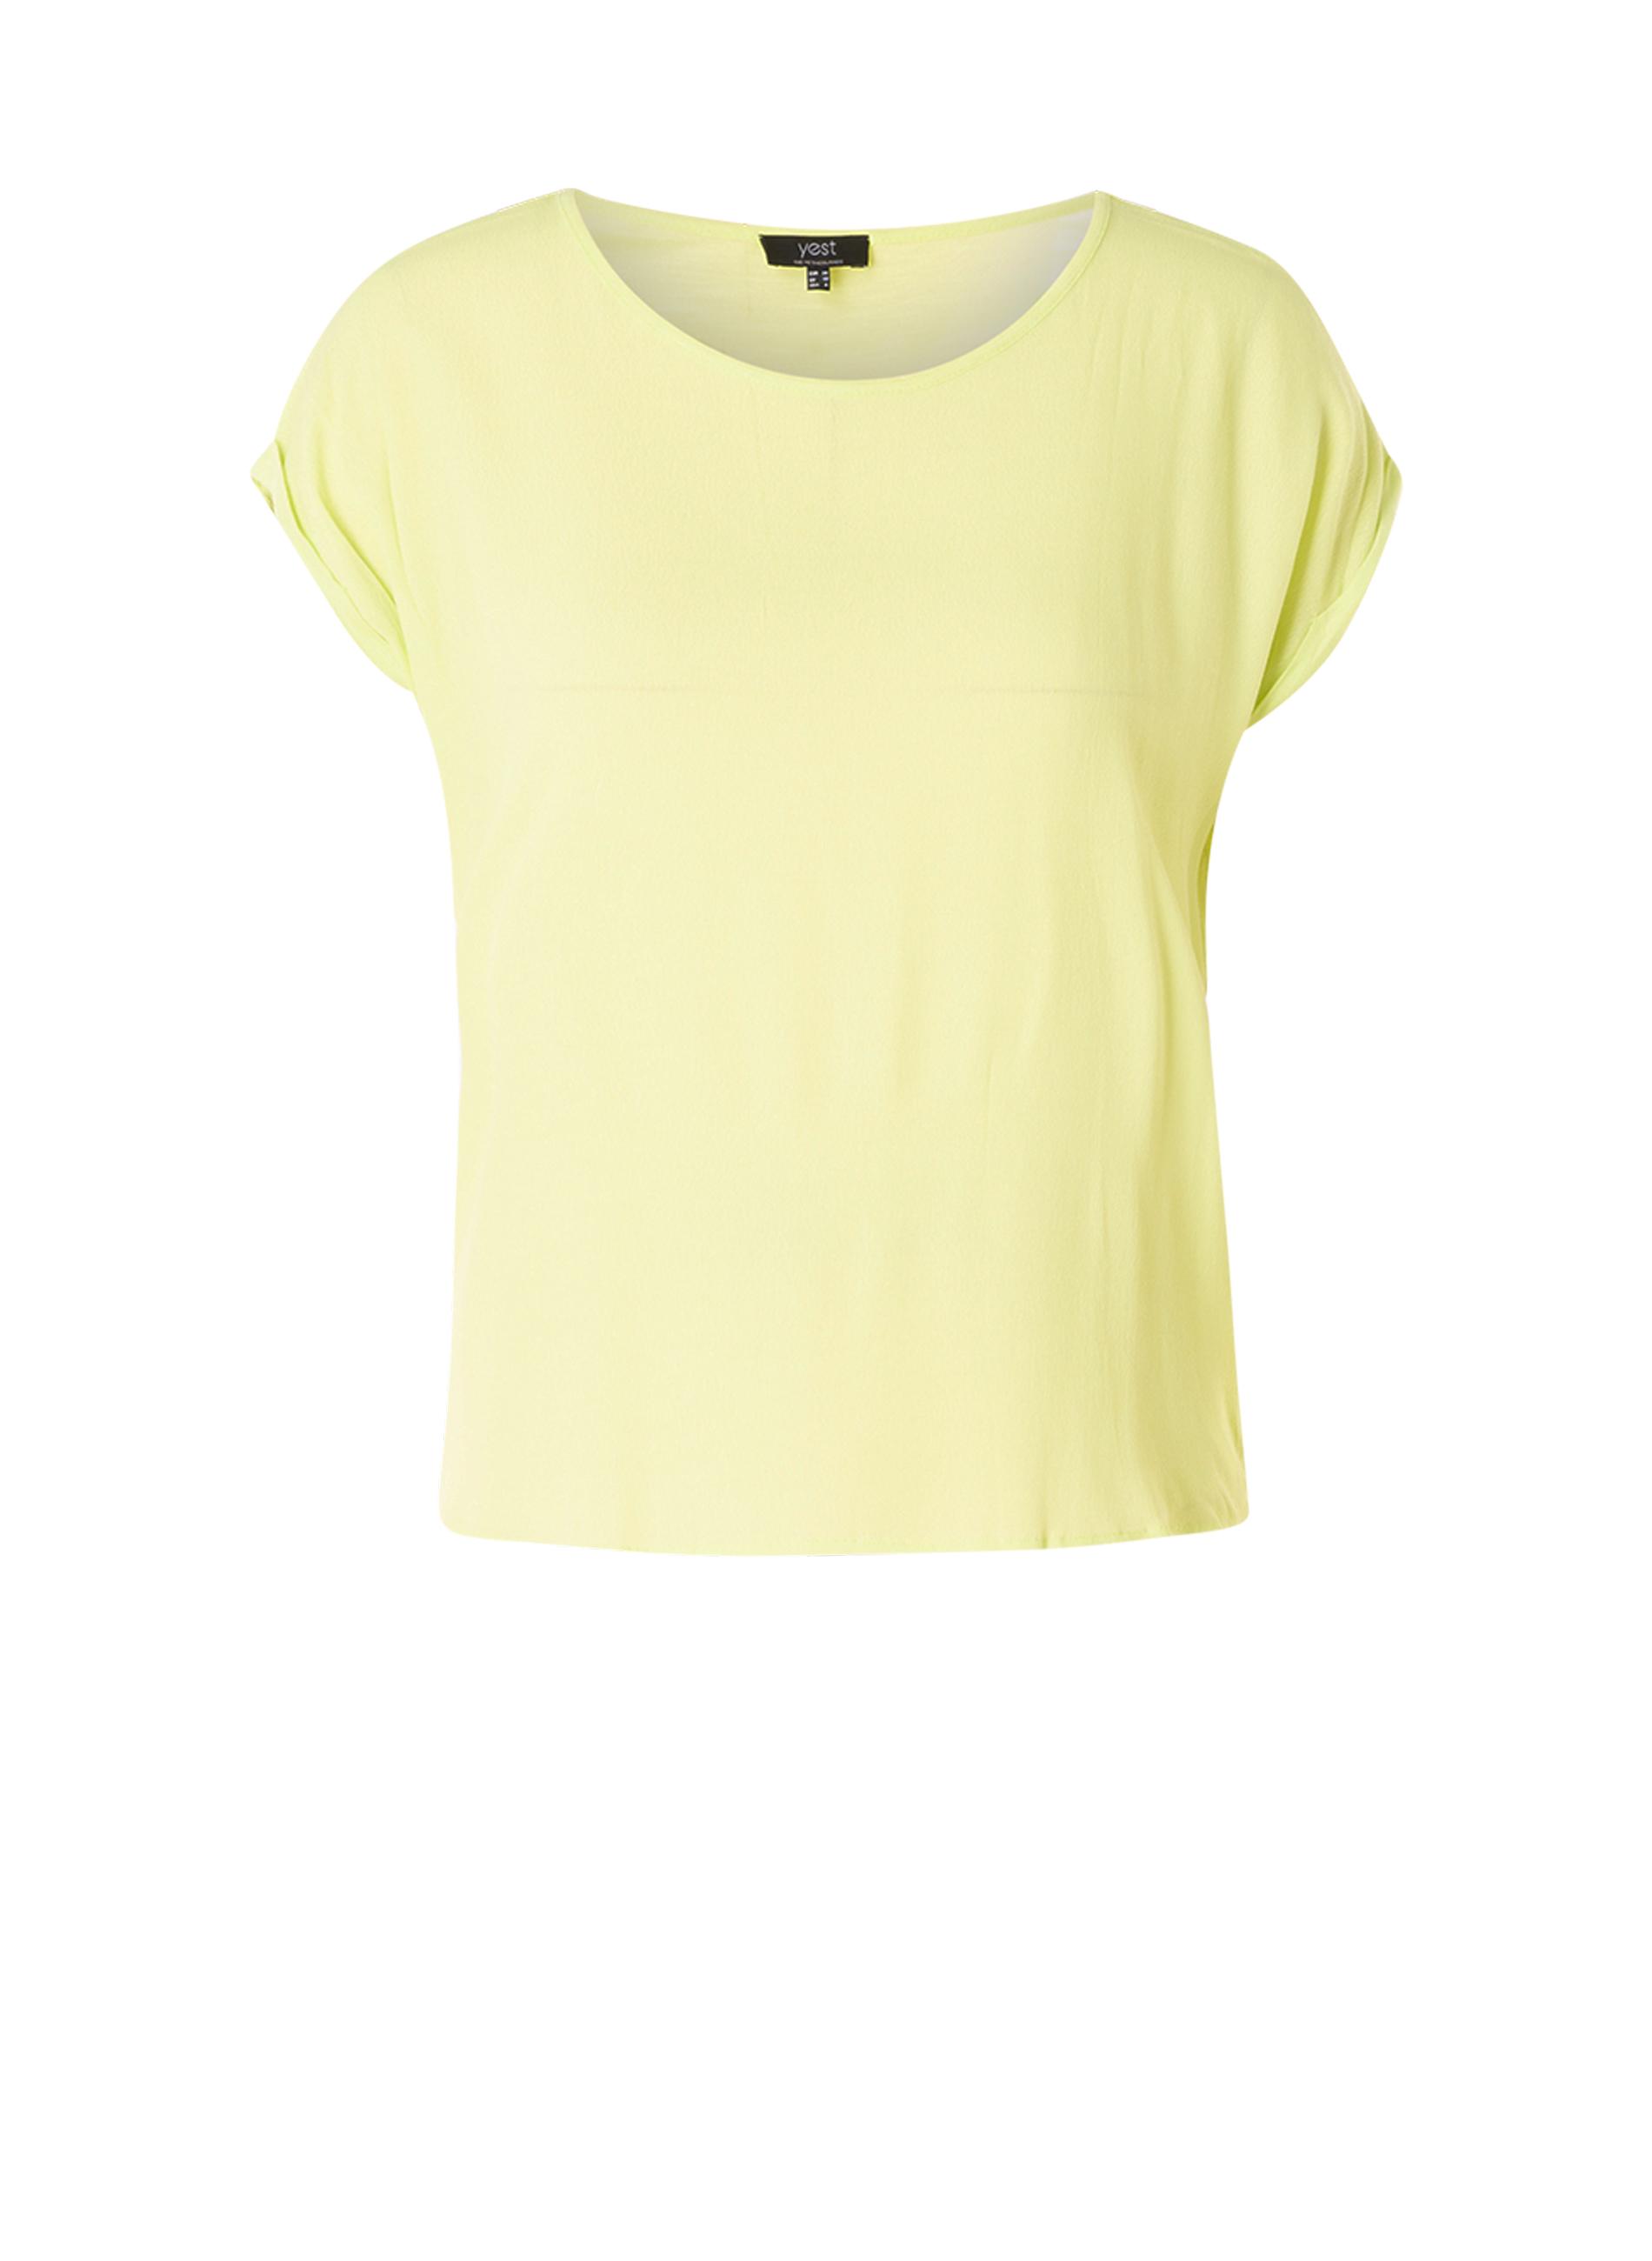 Shirt Lina 76 cm Yesta